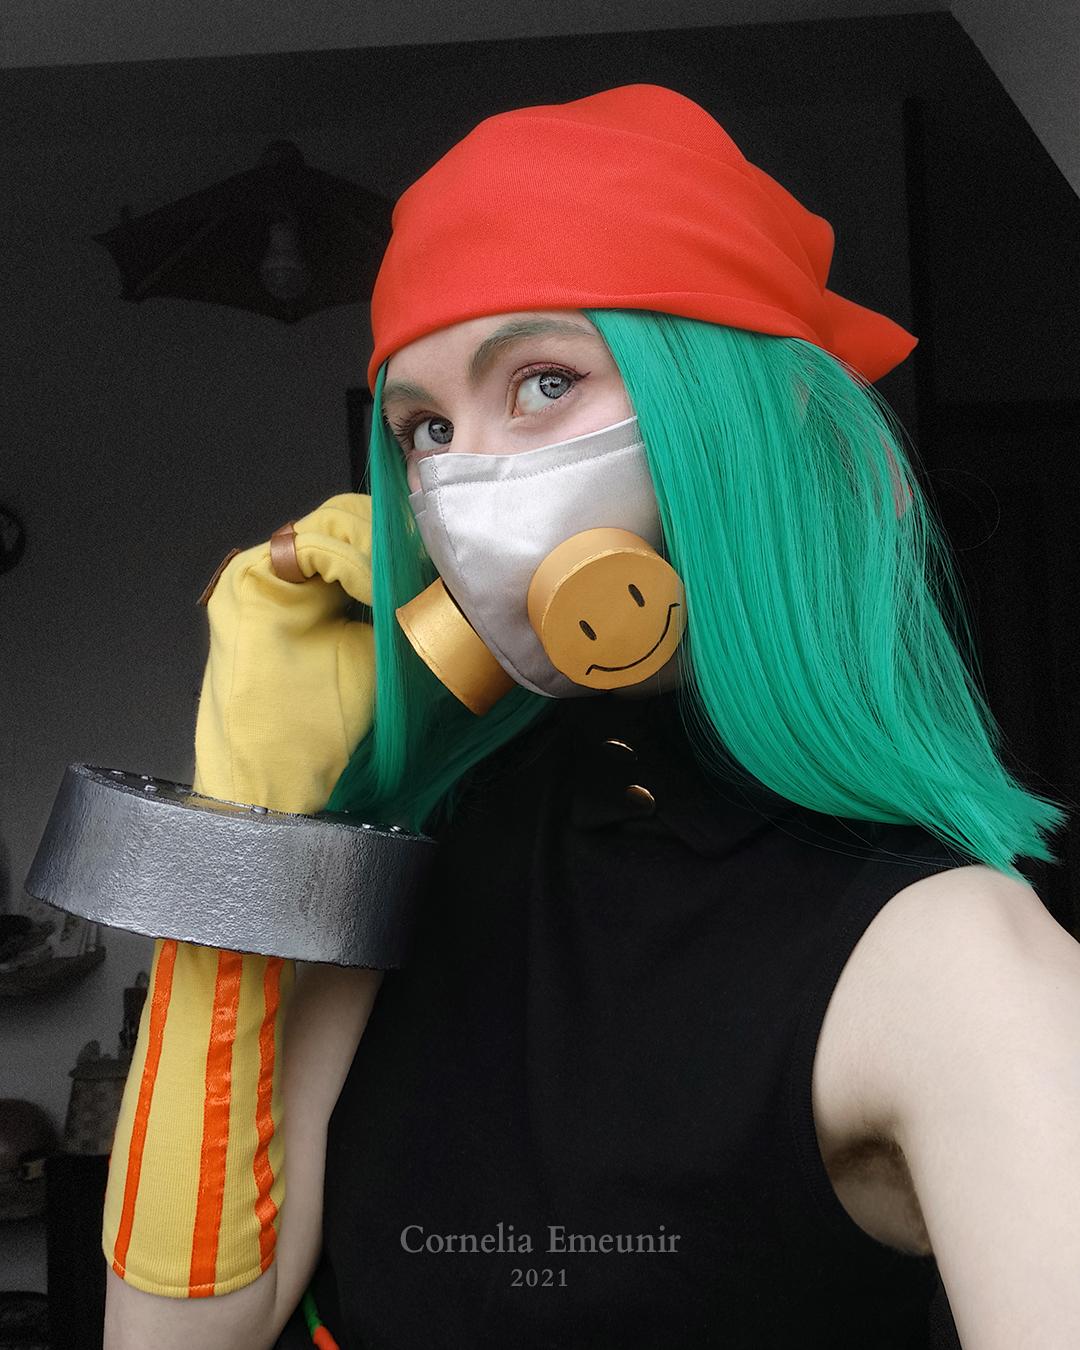 cosplay, handmade, and selfie image